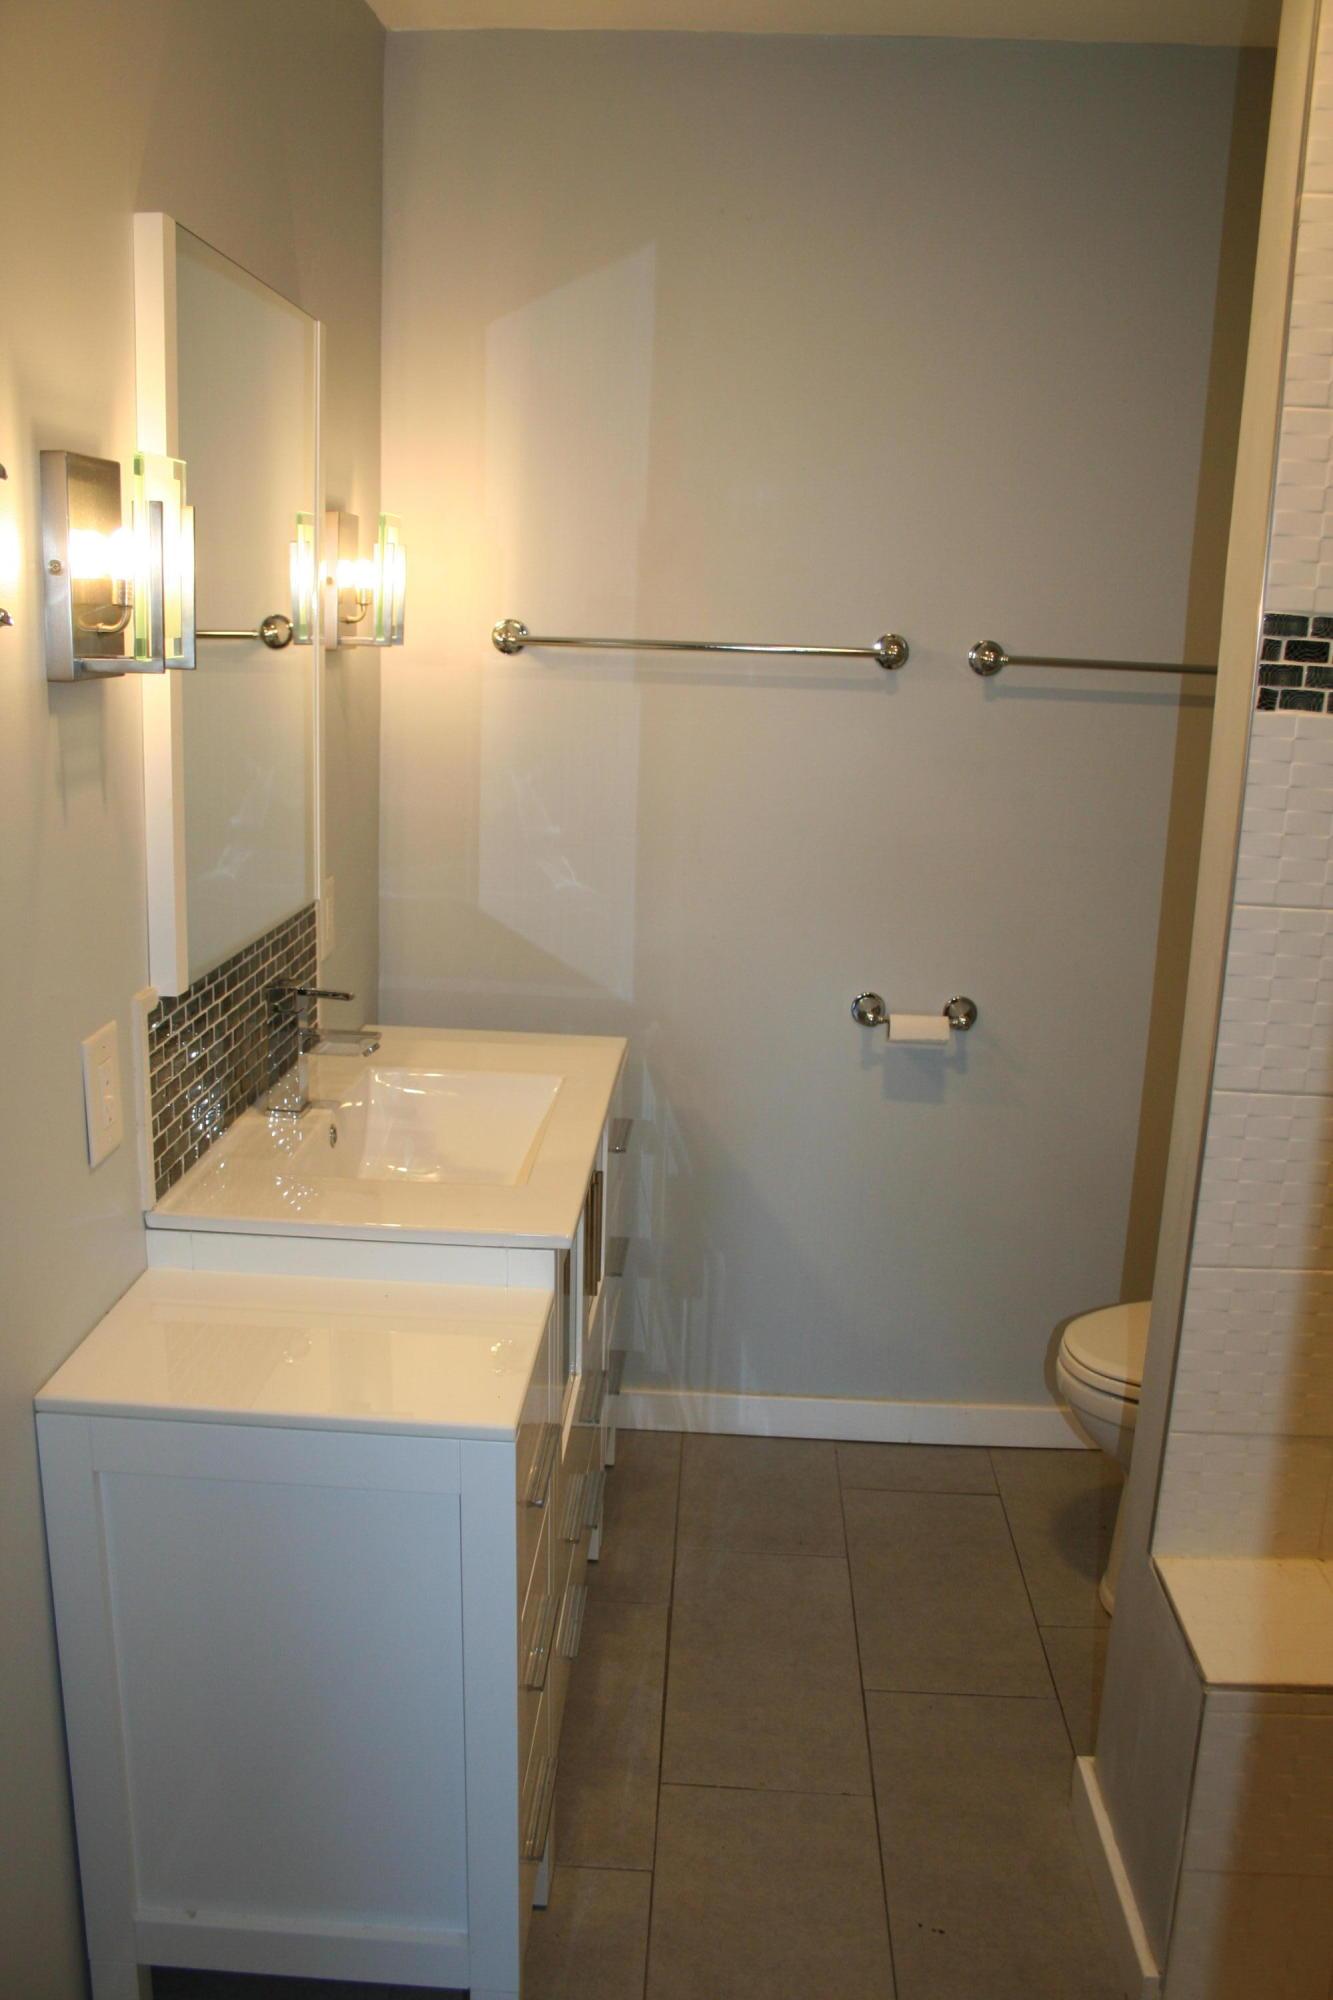 Racine Bathroom Design on closet design, kitchen design, nursery design, garage design, toilet design, bathtub design, pantry design, shower design, small bath design, exterior design, interior design, room design, door design, foyer design, tile design, bedroom design, washroom design, restroom design, staircase design, basement design,